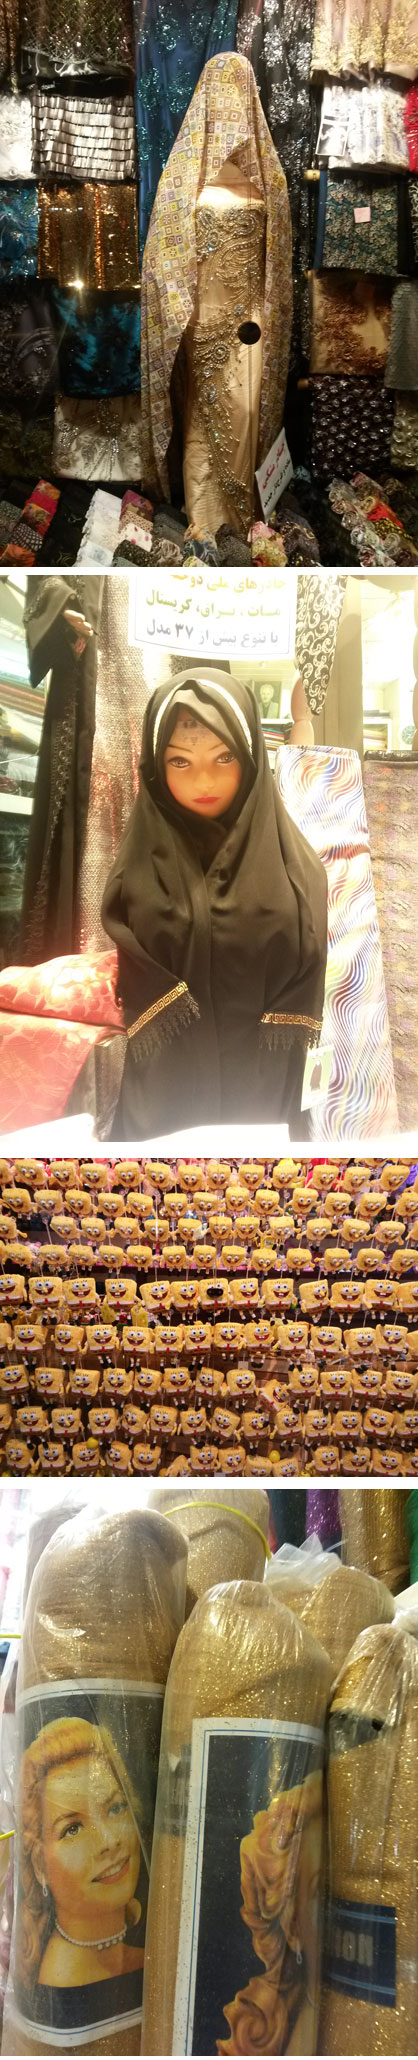 iran_style_2